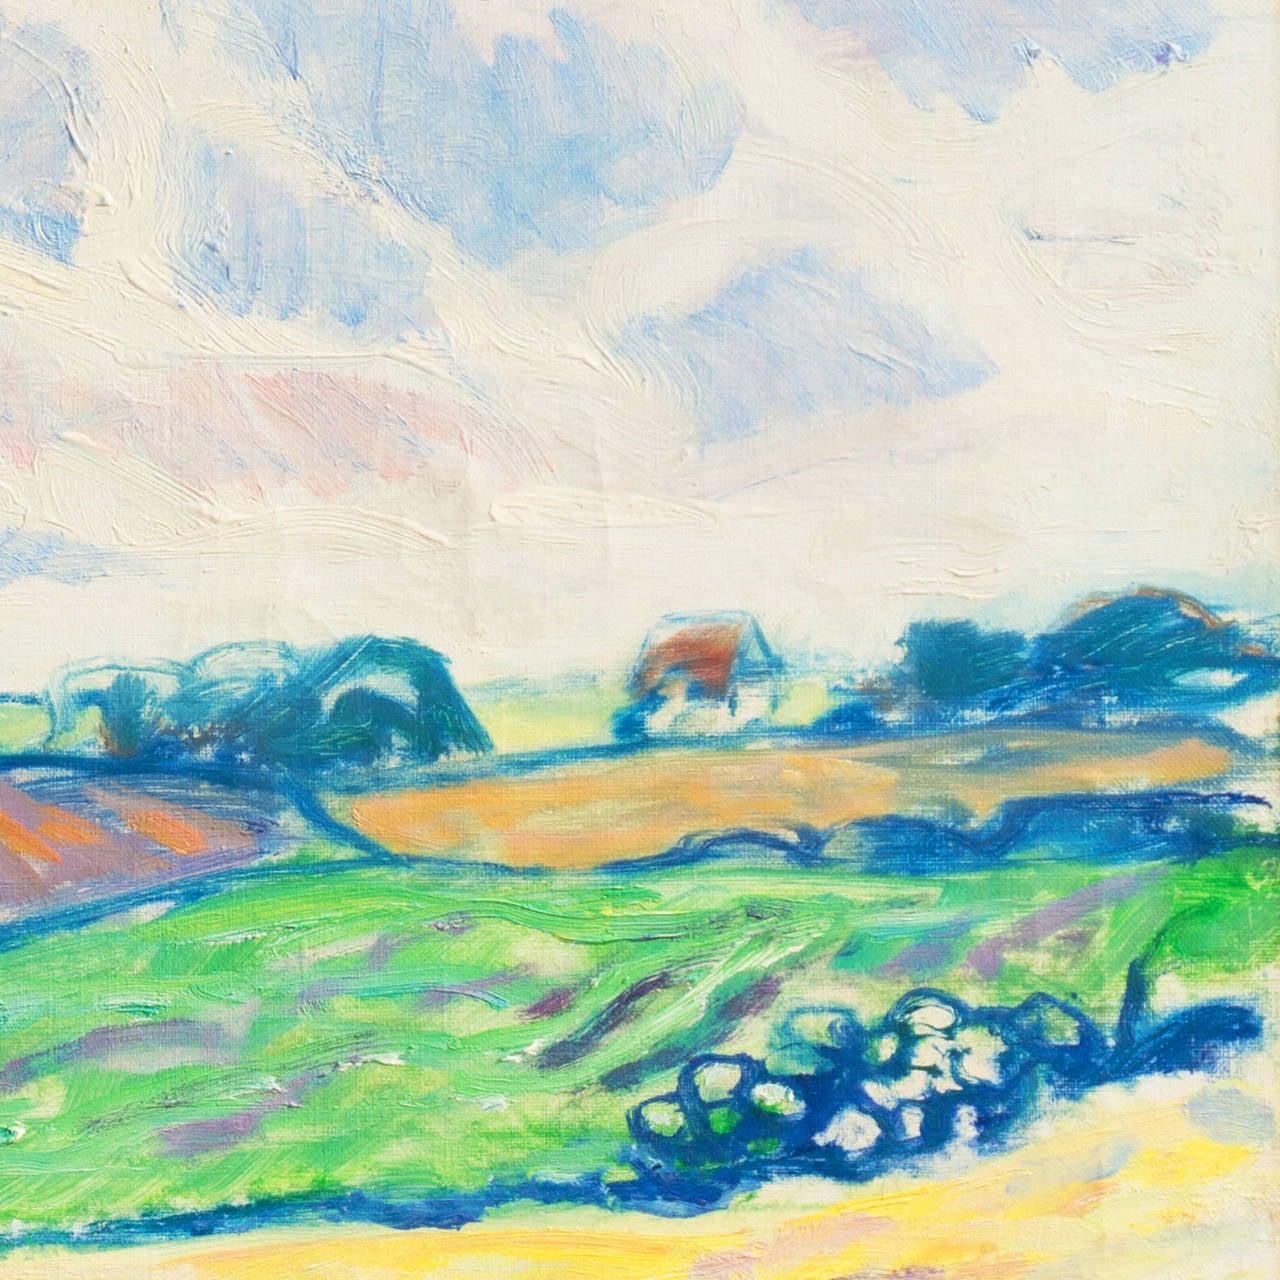 Spring Landscape - Expressionist Painting by Ejnar R. Kragh